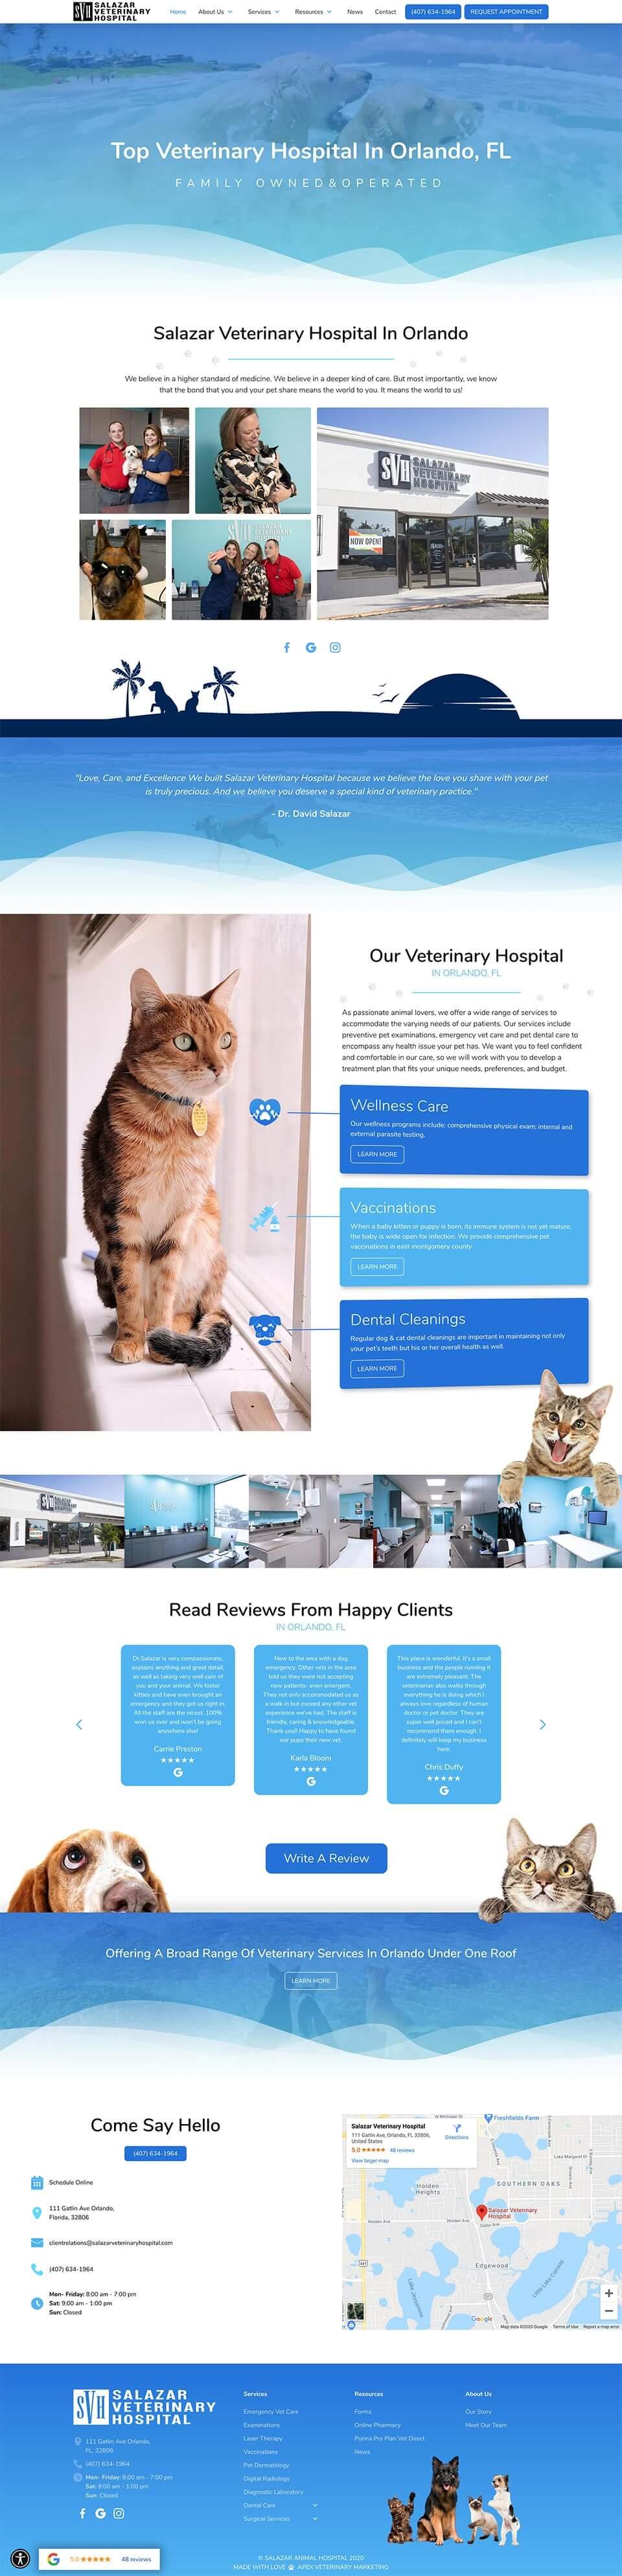 Salazar Veterinary Hospital